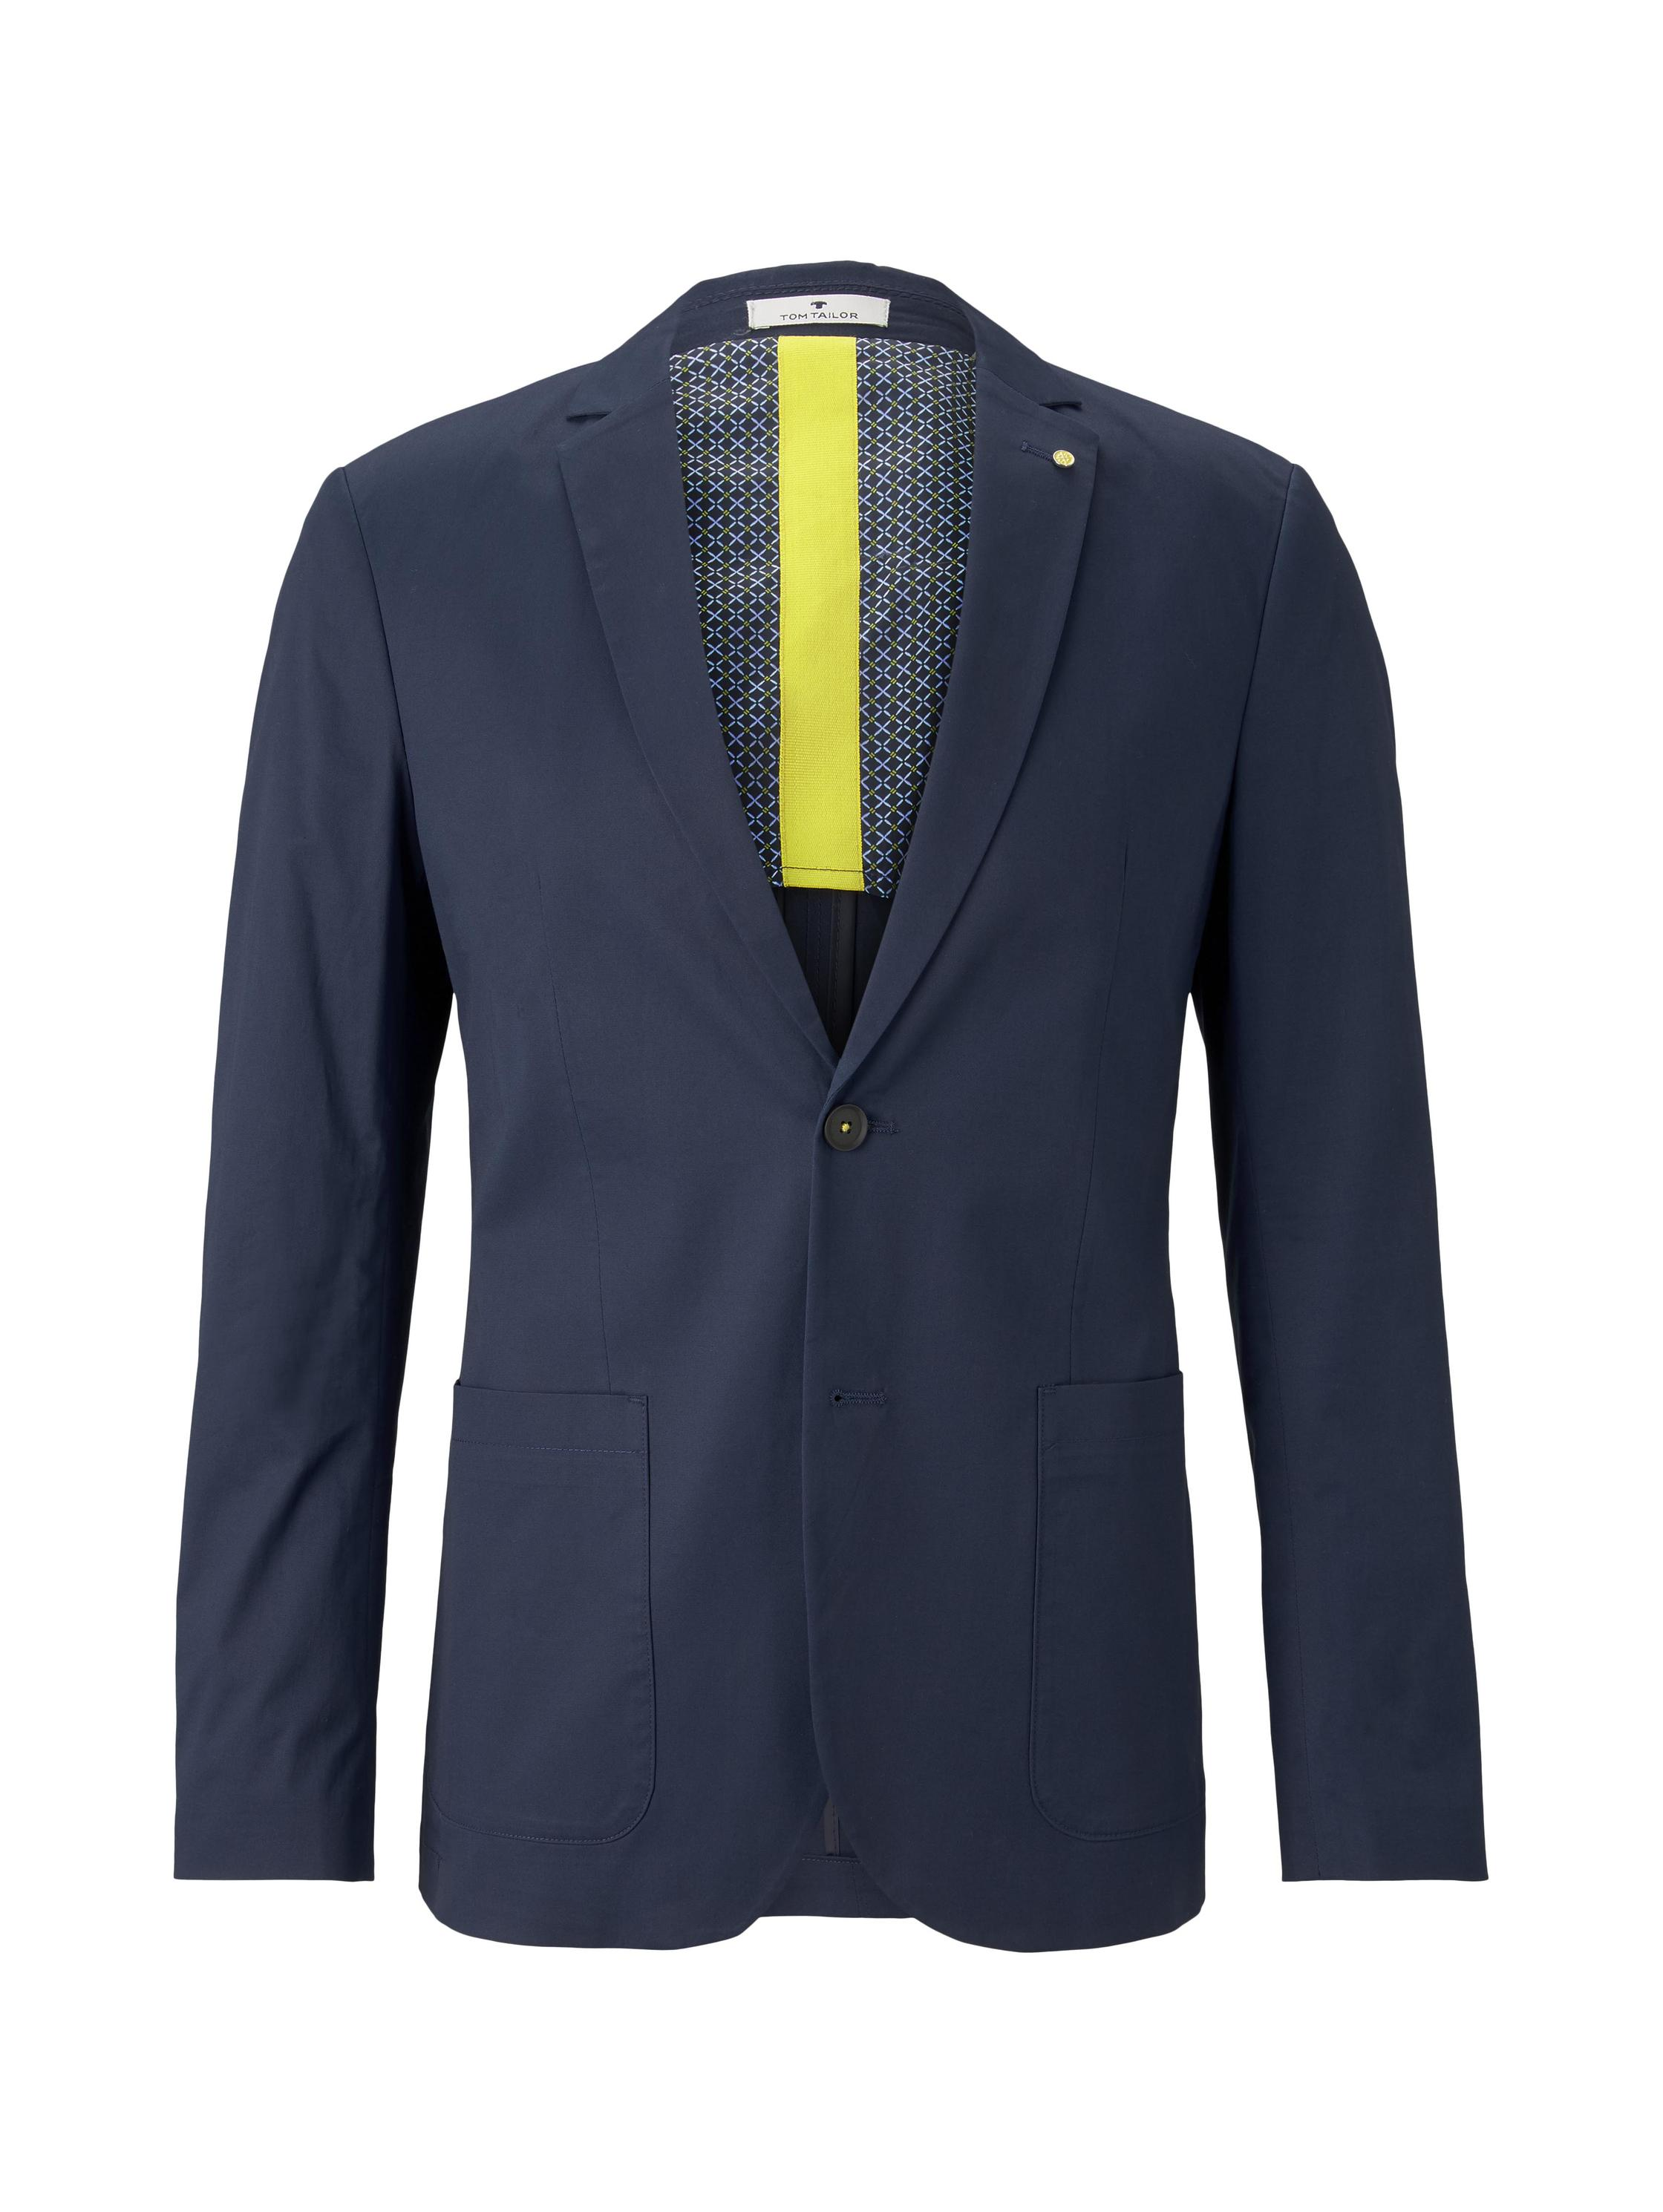 casual blazer, Black Iris Blue